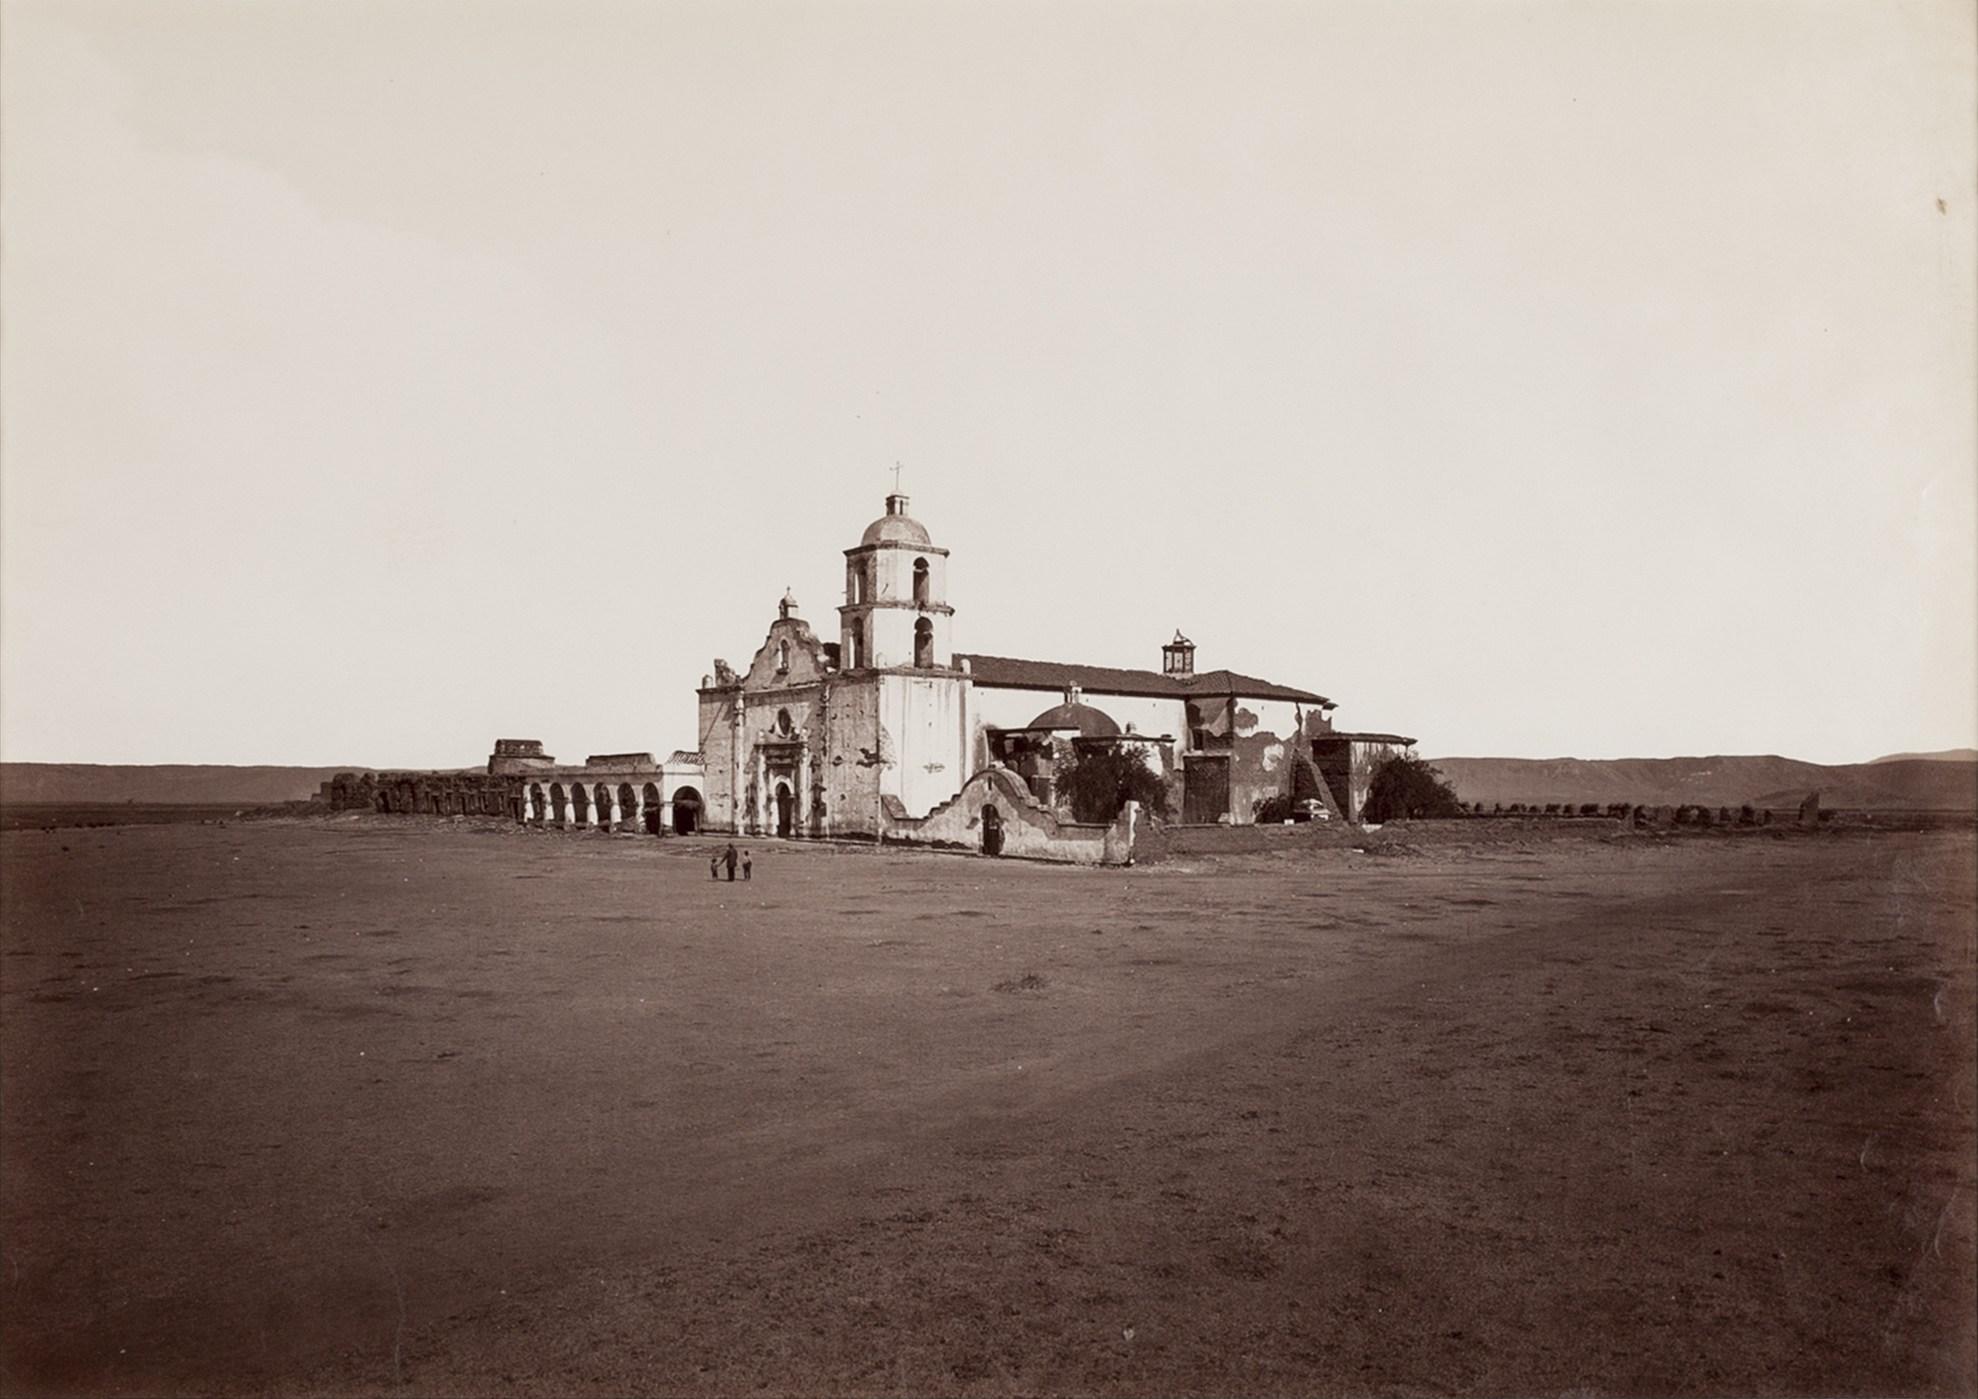 Carleton E. Watkins, Mission San Luis Rey, ca. 1877